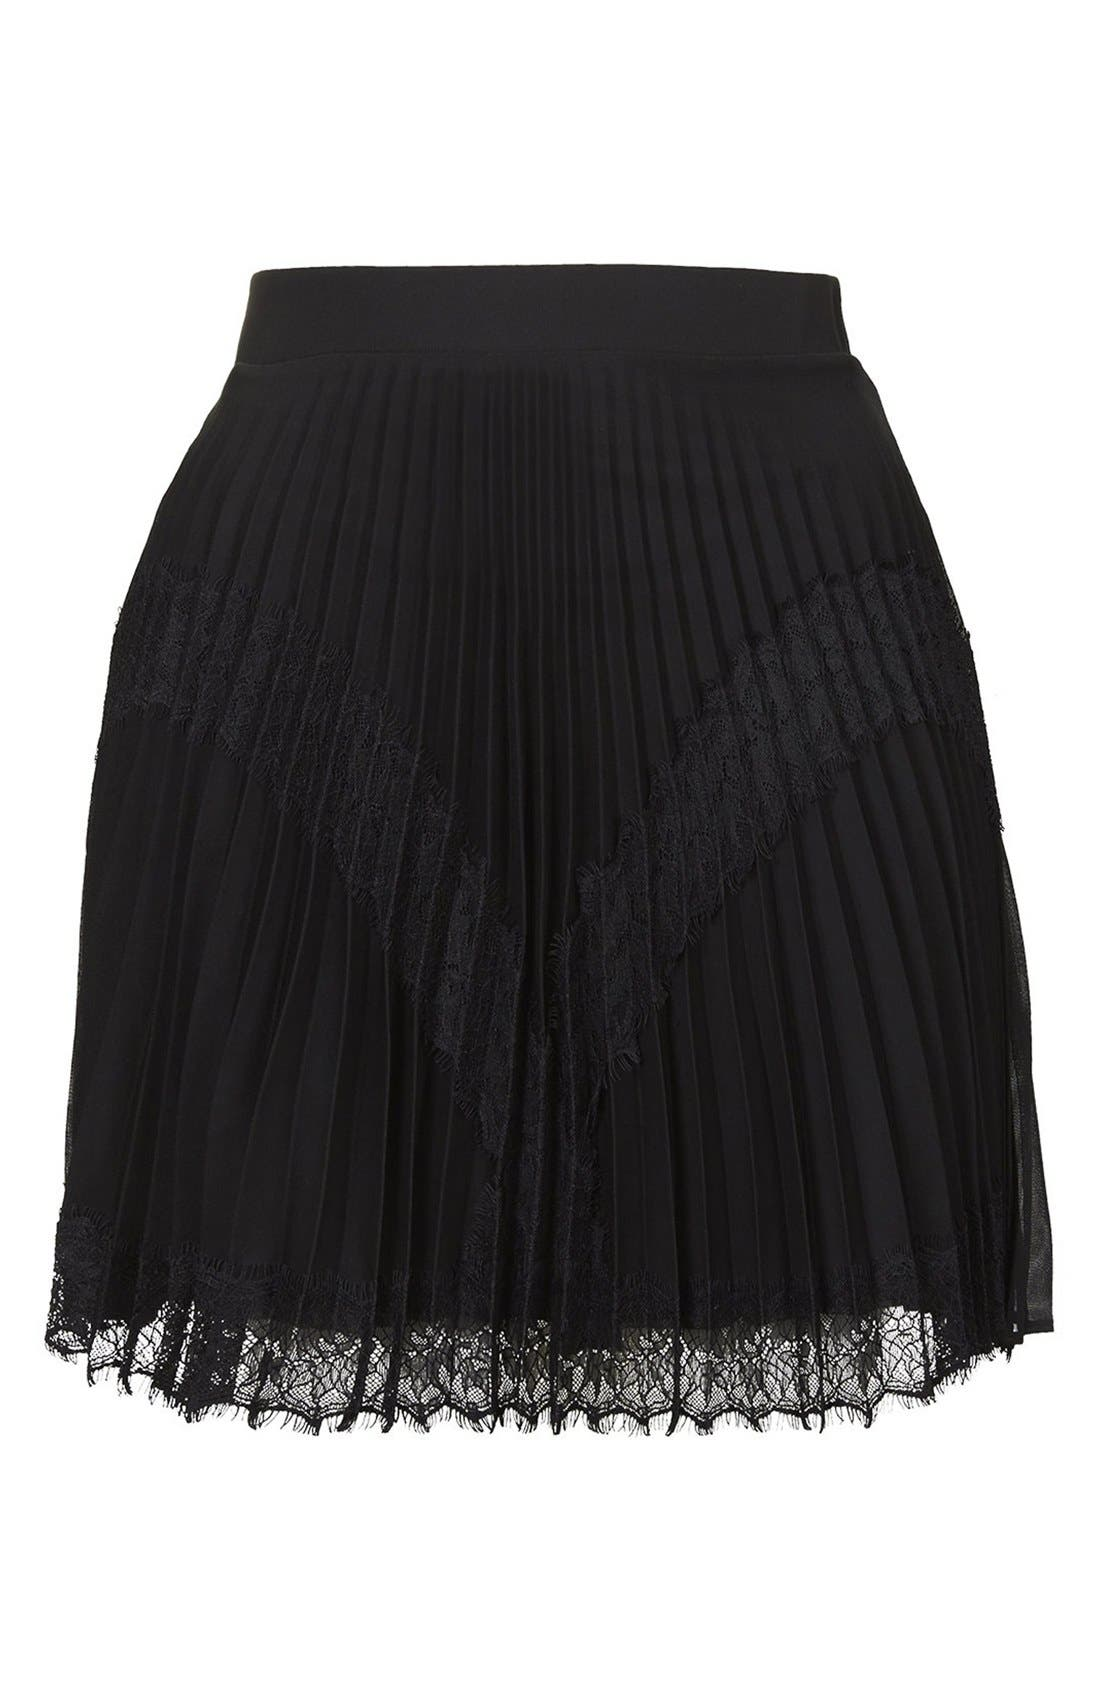 Alternate Image 3  - Topshop Pleat Eyelash Skirt